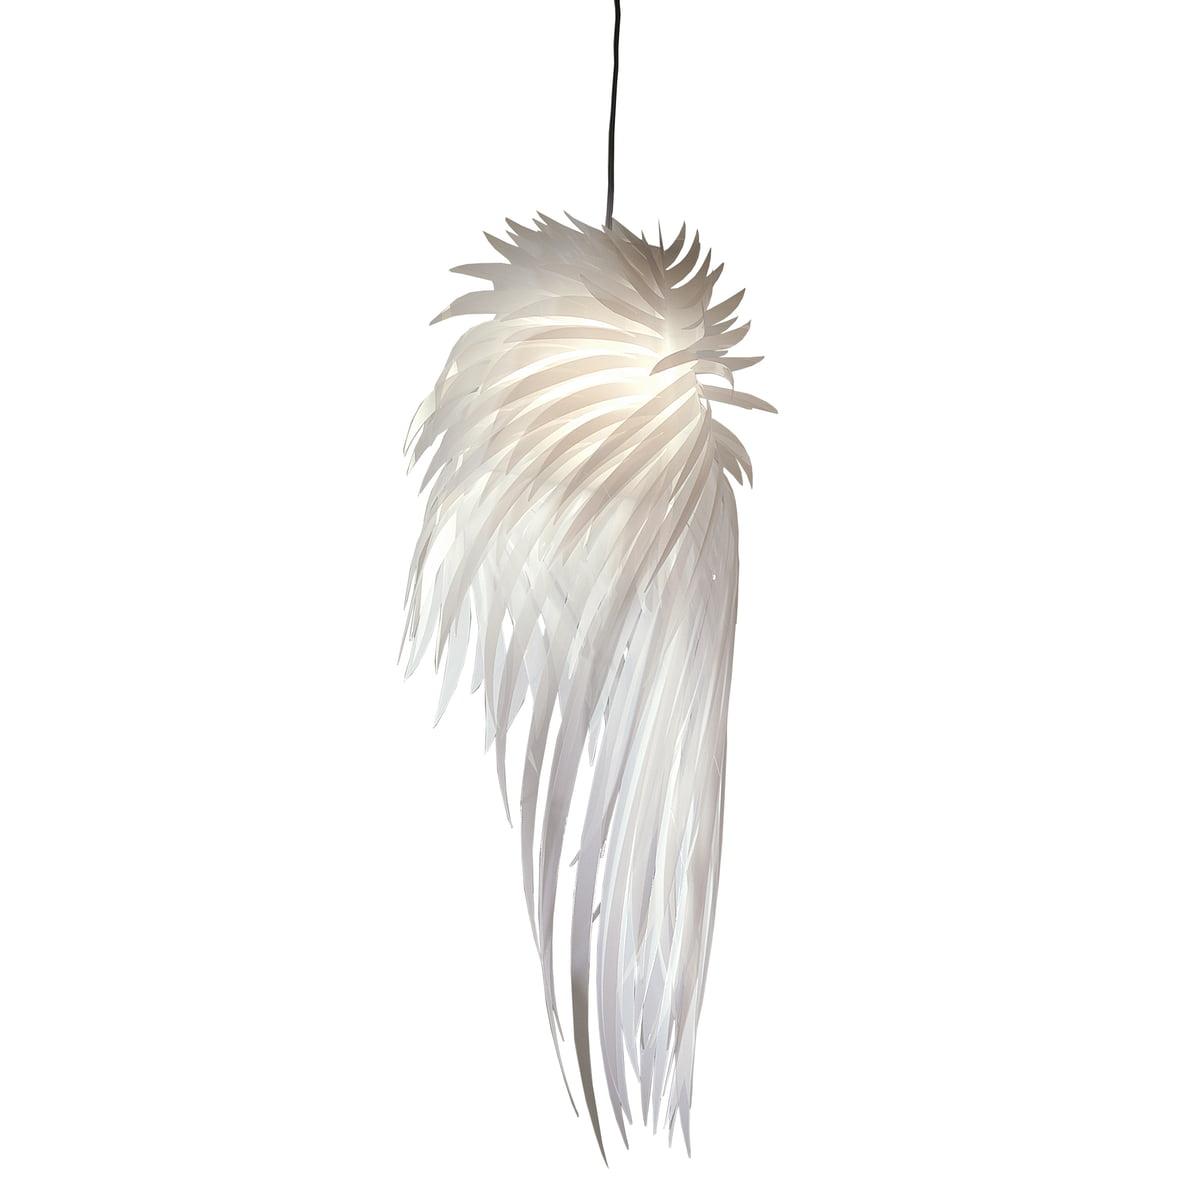 icarus pendant lamp  artecnica  shop - artecnica  icarus pendant lamp